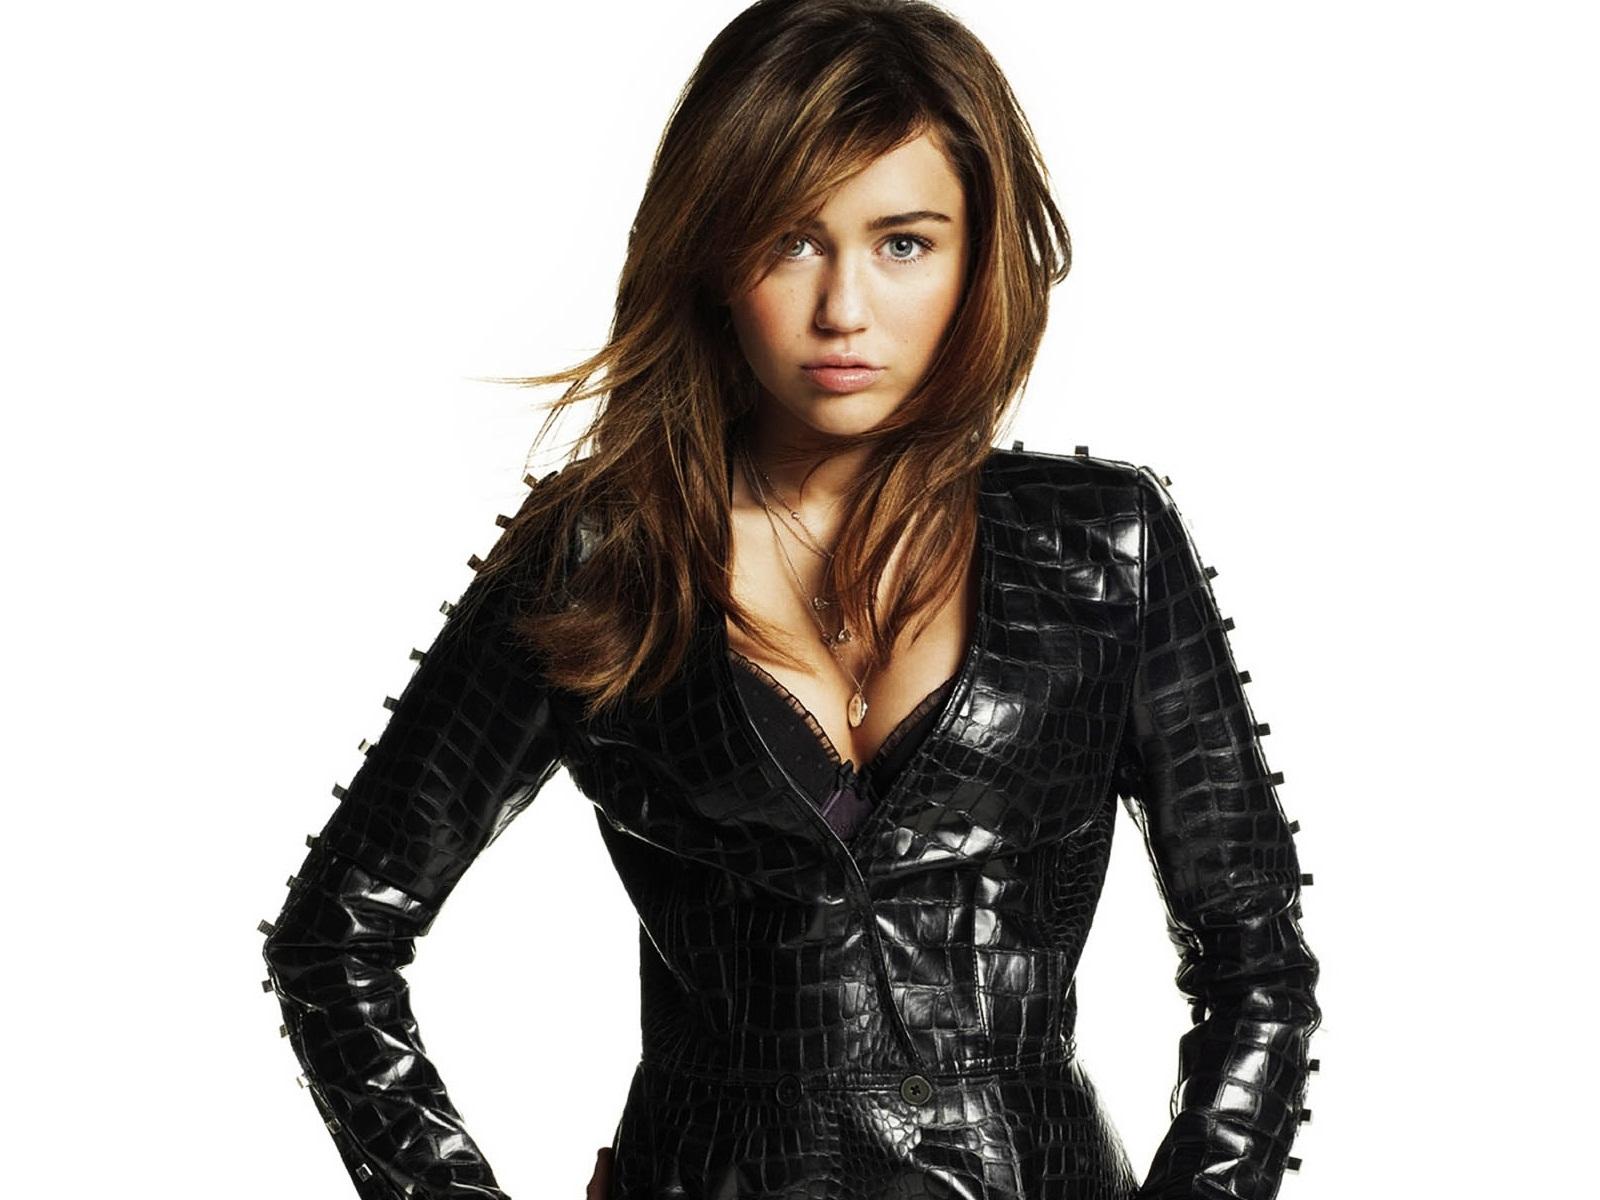 Miley Cyrus 50 wallpaper